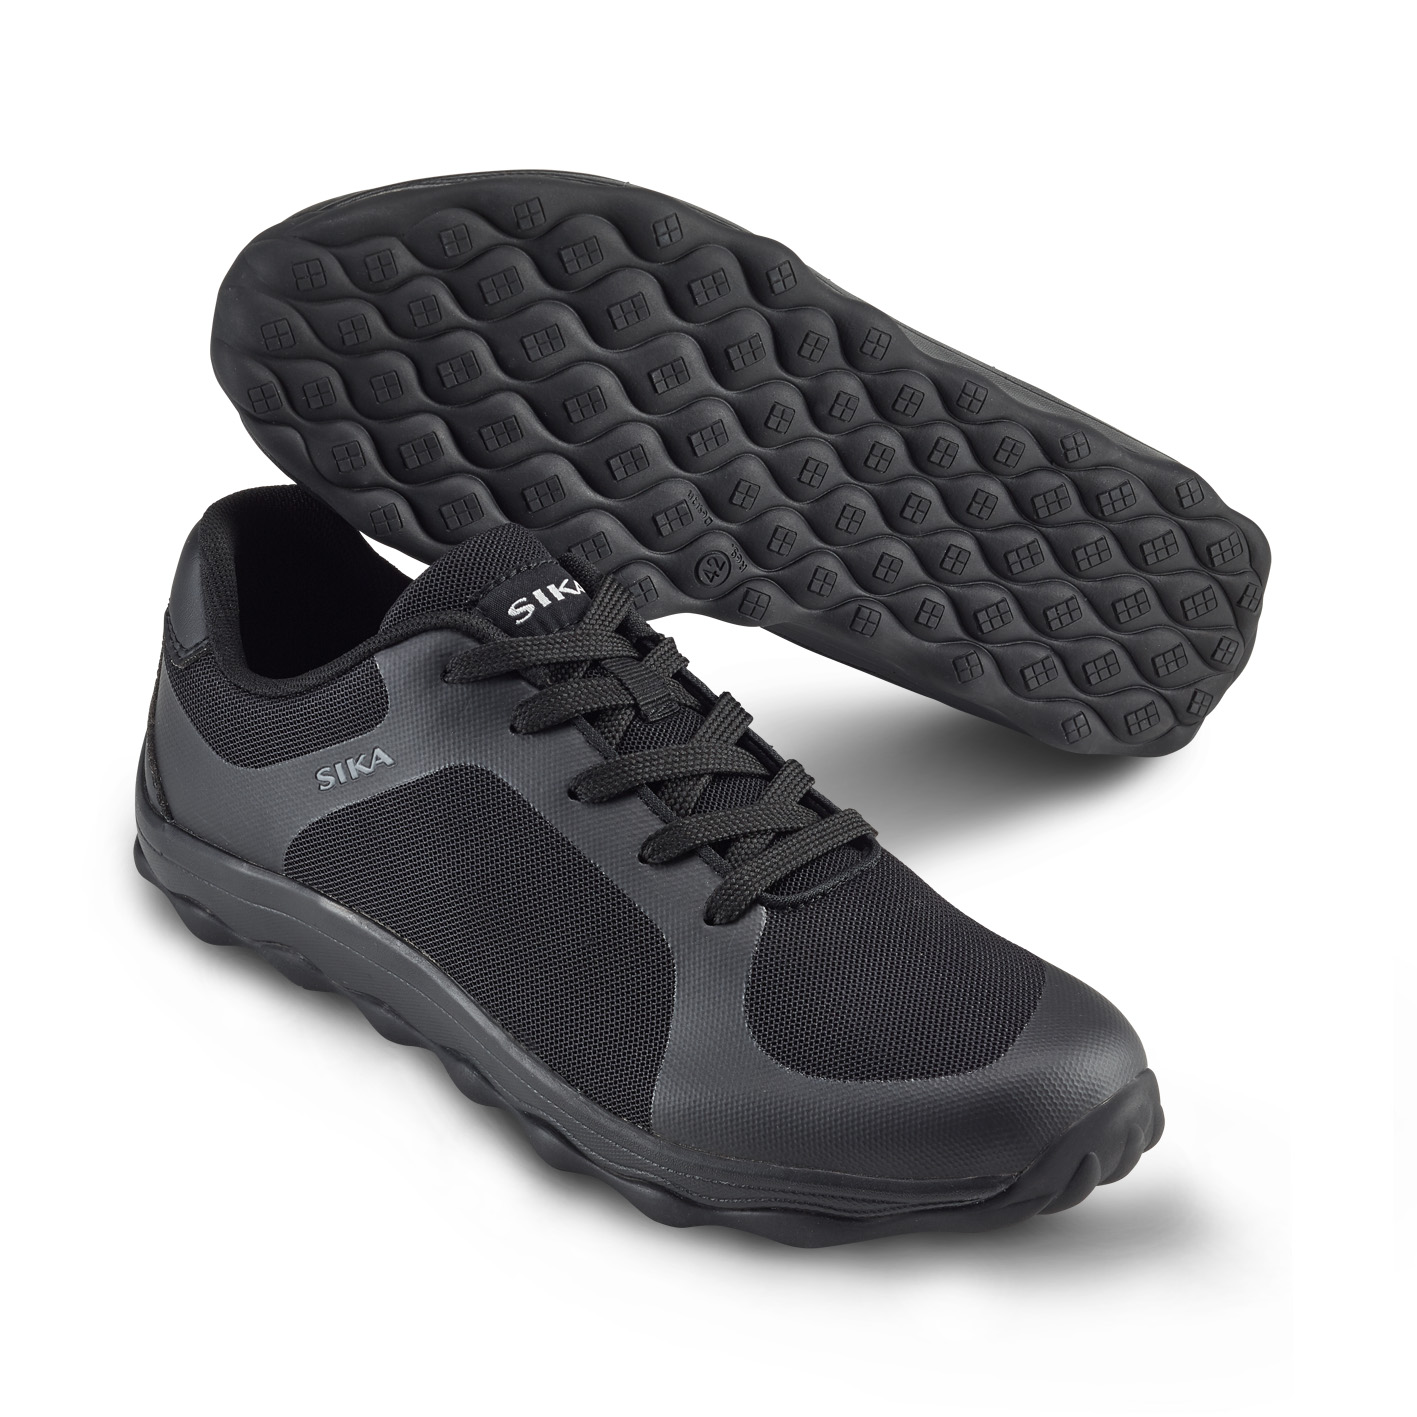 Mjuk arbetssko i sneakersmodell Svart (46)